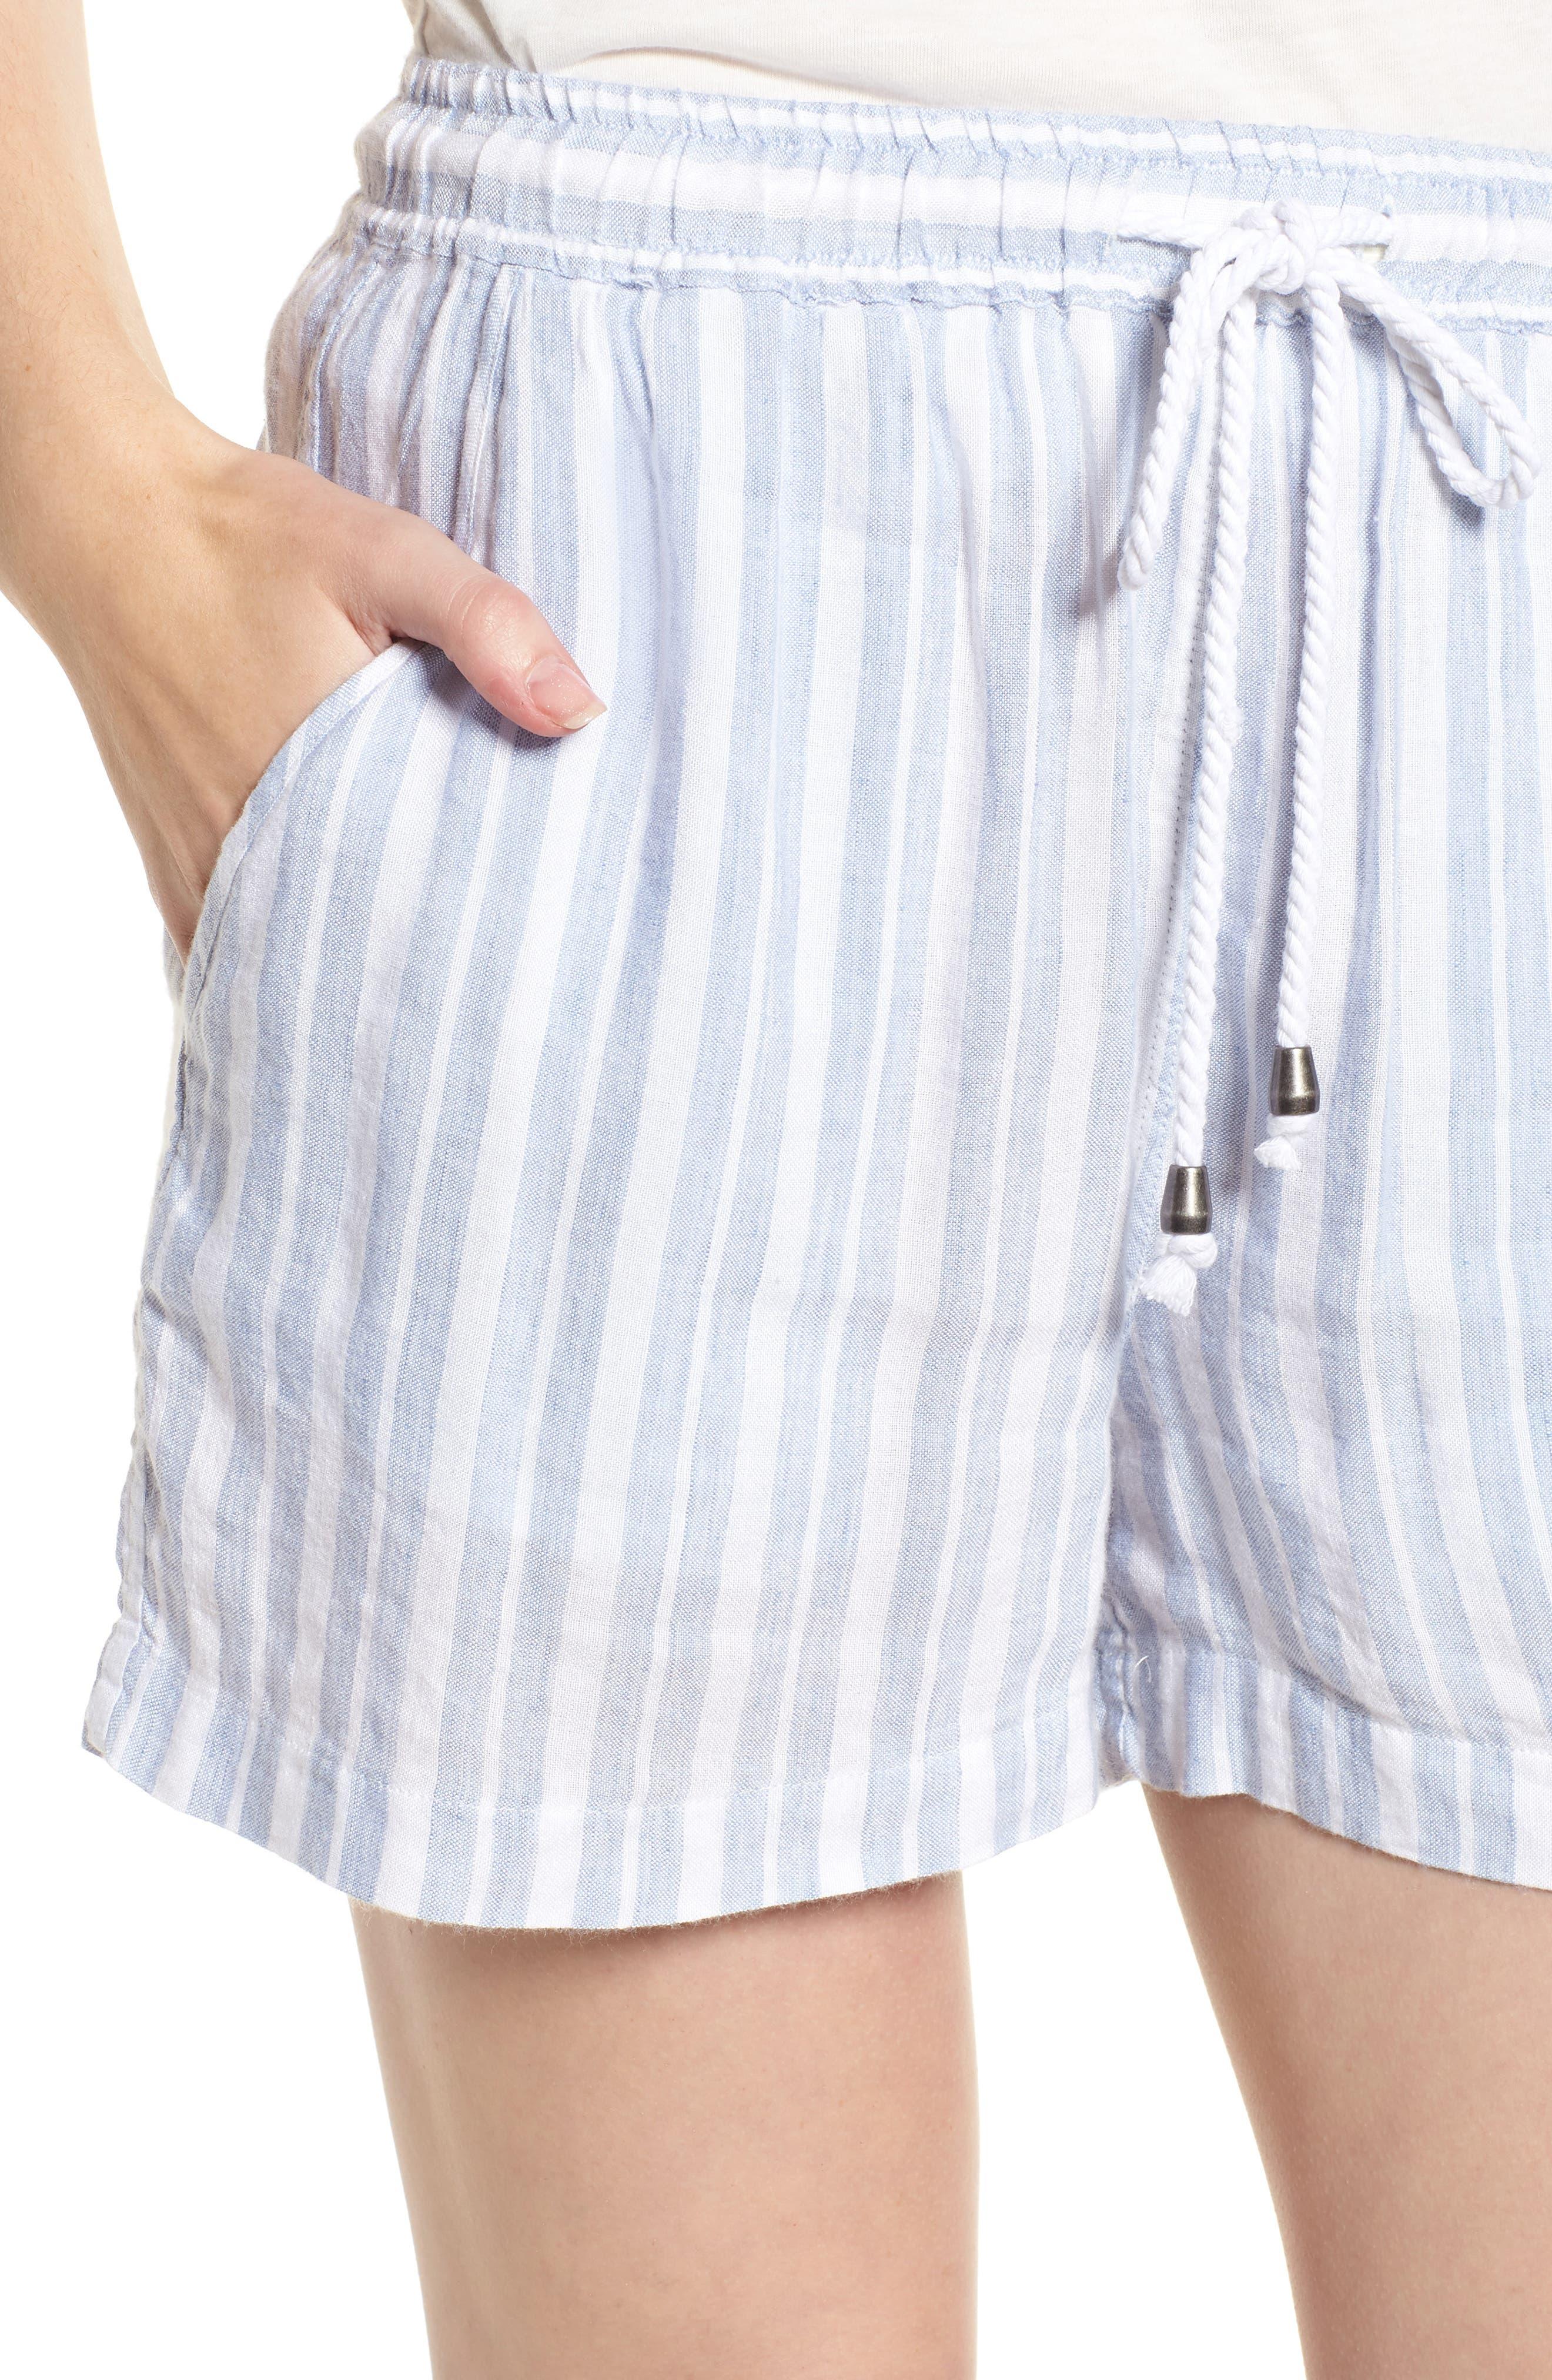 Brea Shorts,                             Alternate thumbnail 4, color,                             HOLLAND STRIPE